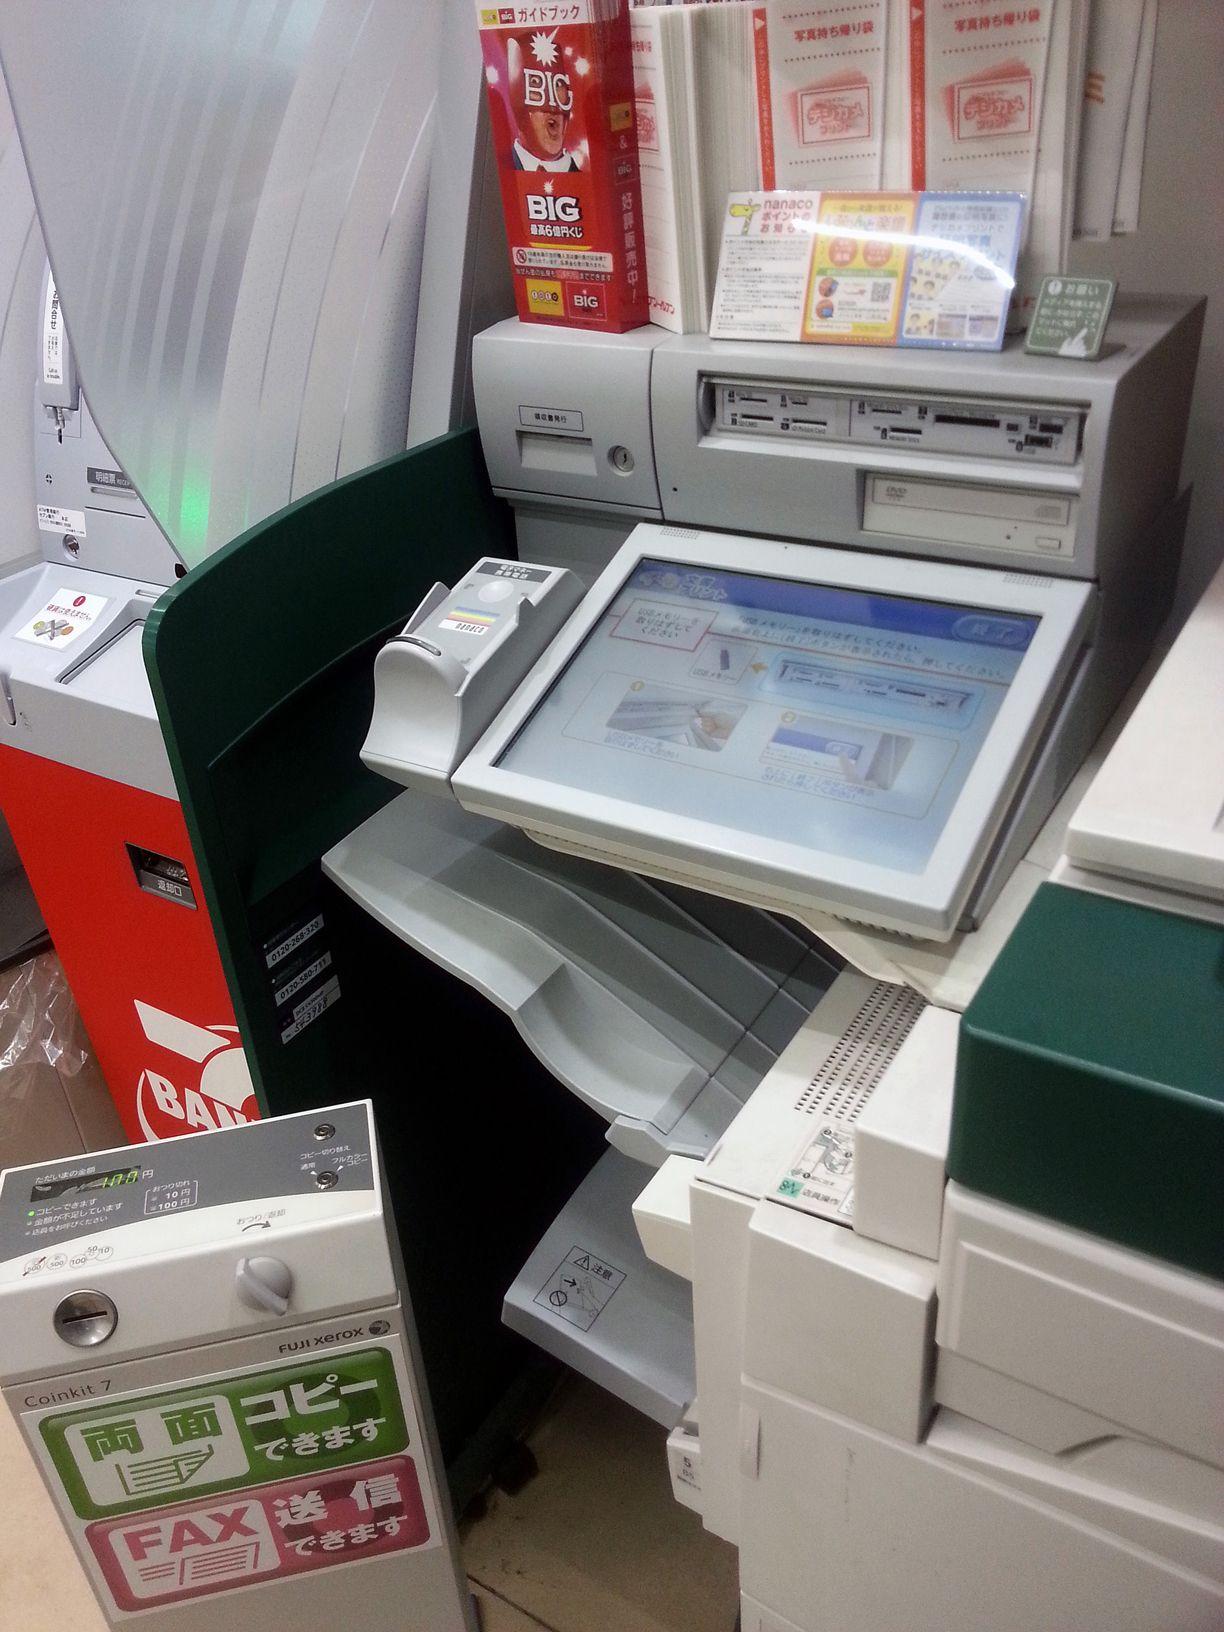 Convenient store conbini multifunktionskopiermaschinen